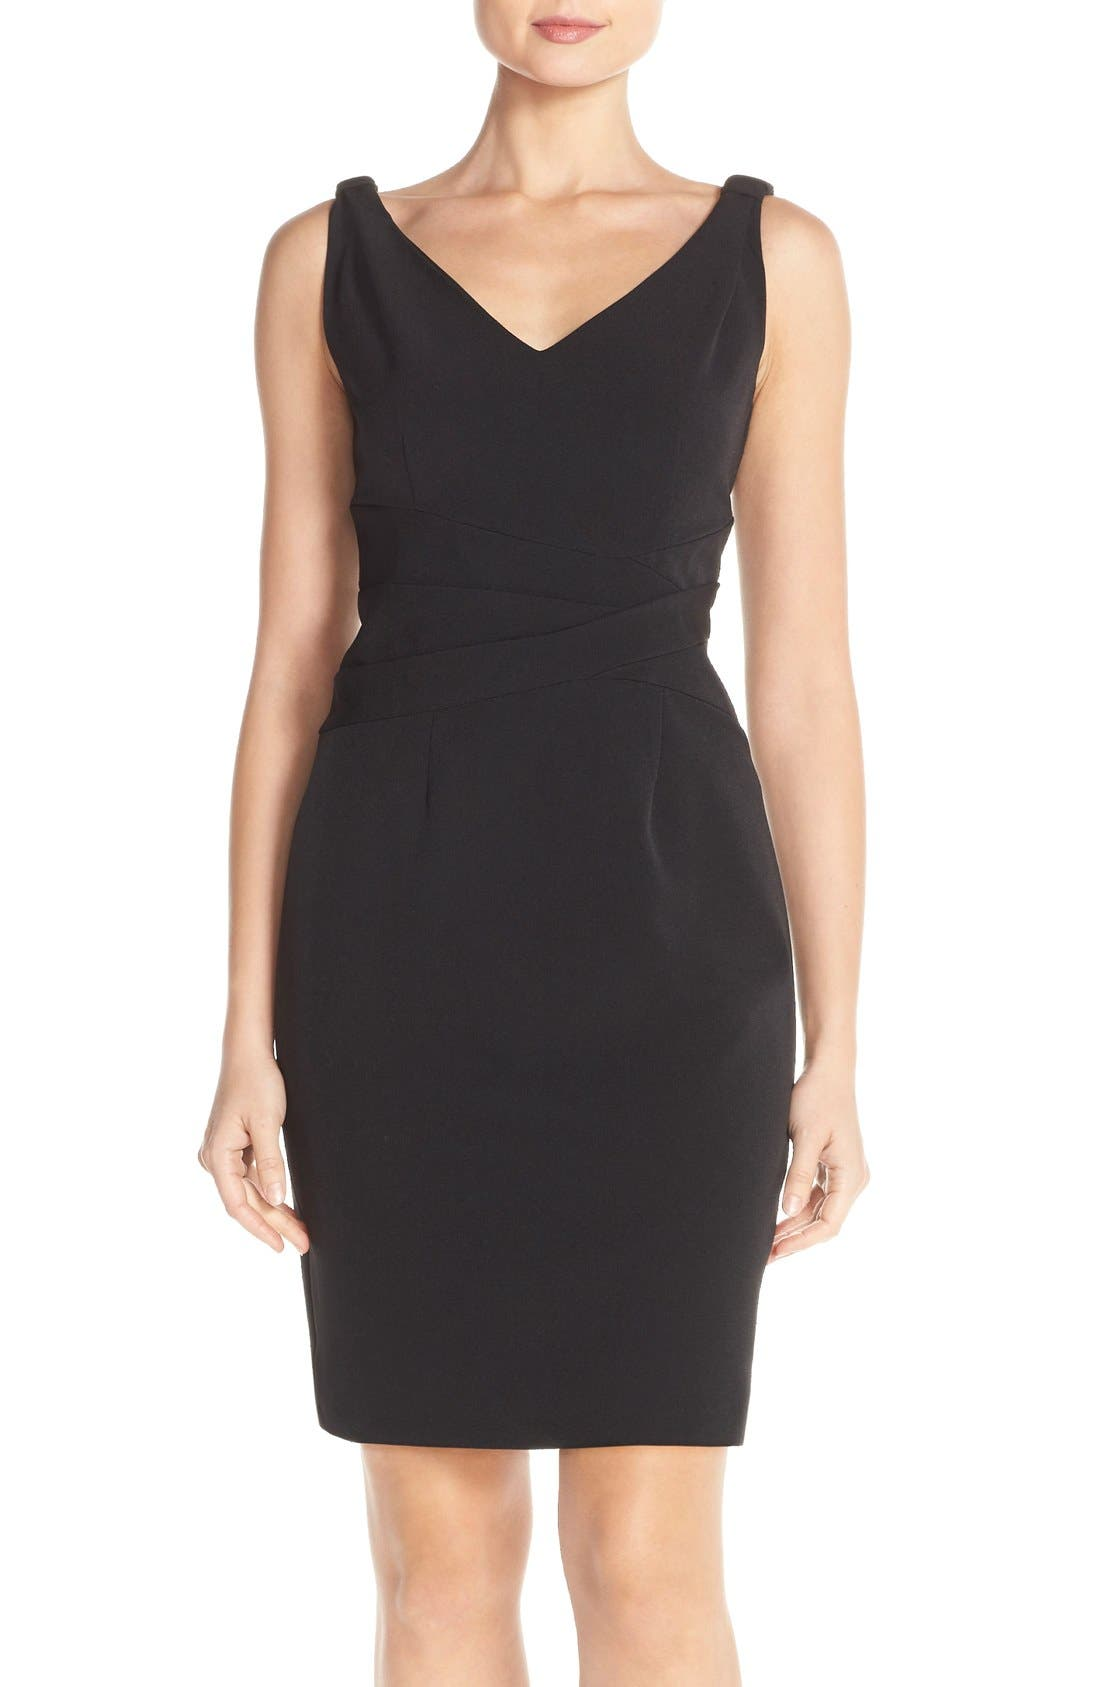 Alternate Image 1 Selected - Adrianna Papell Knot Shoulder Crepe Sheath Dress (Regular & Petite)